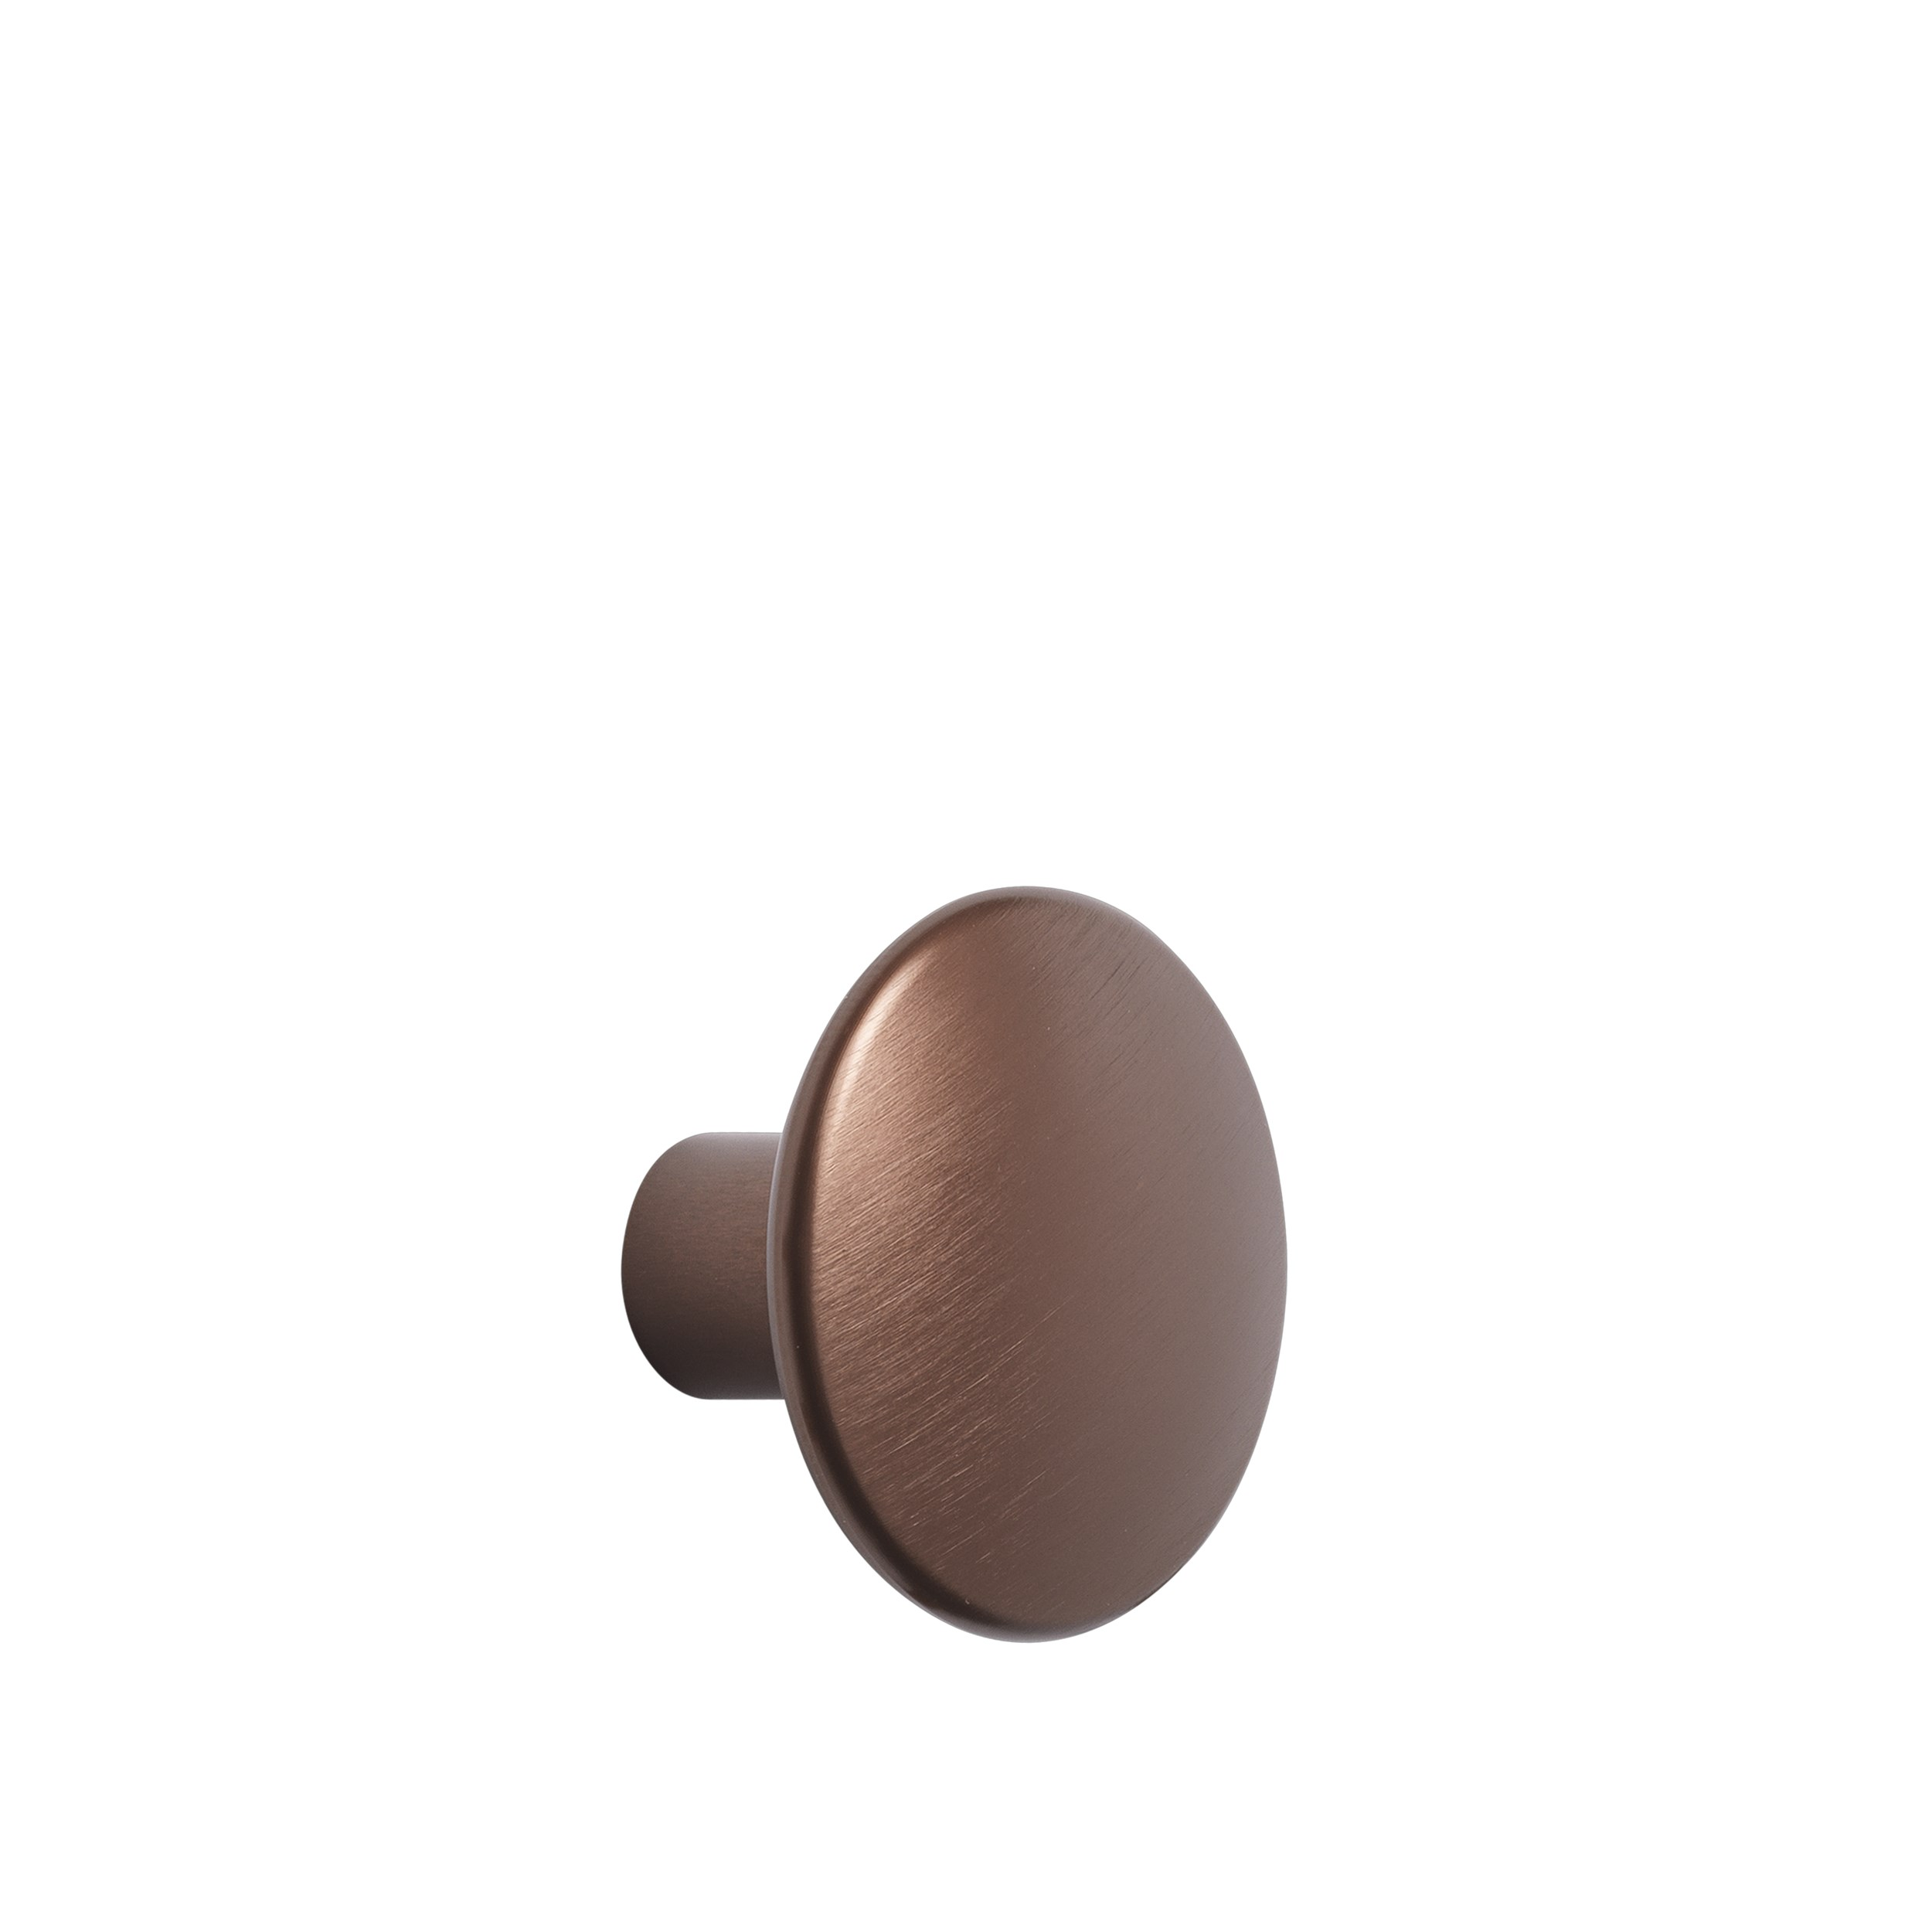 Dots metal large Ø 5 cm umber